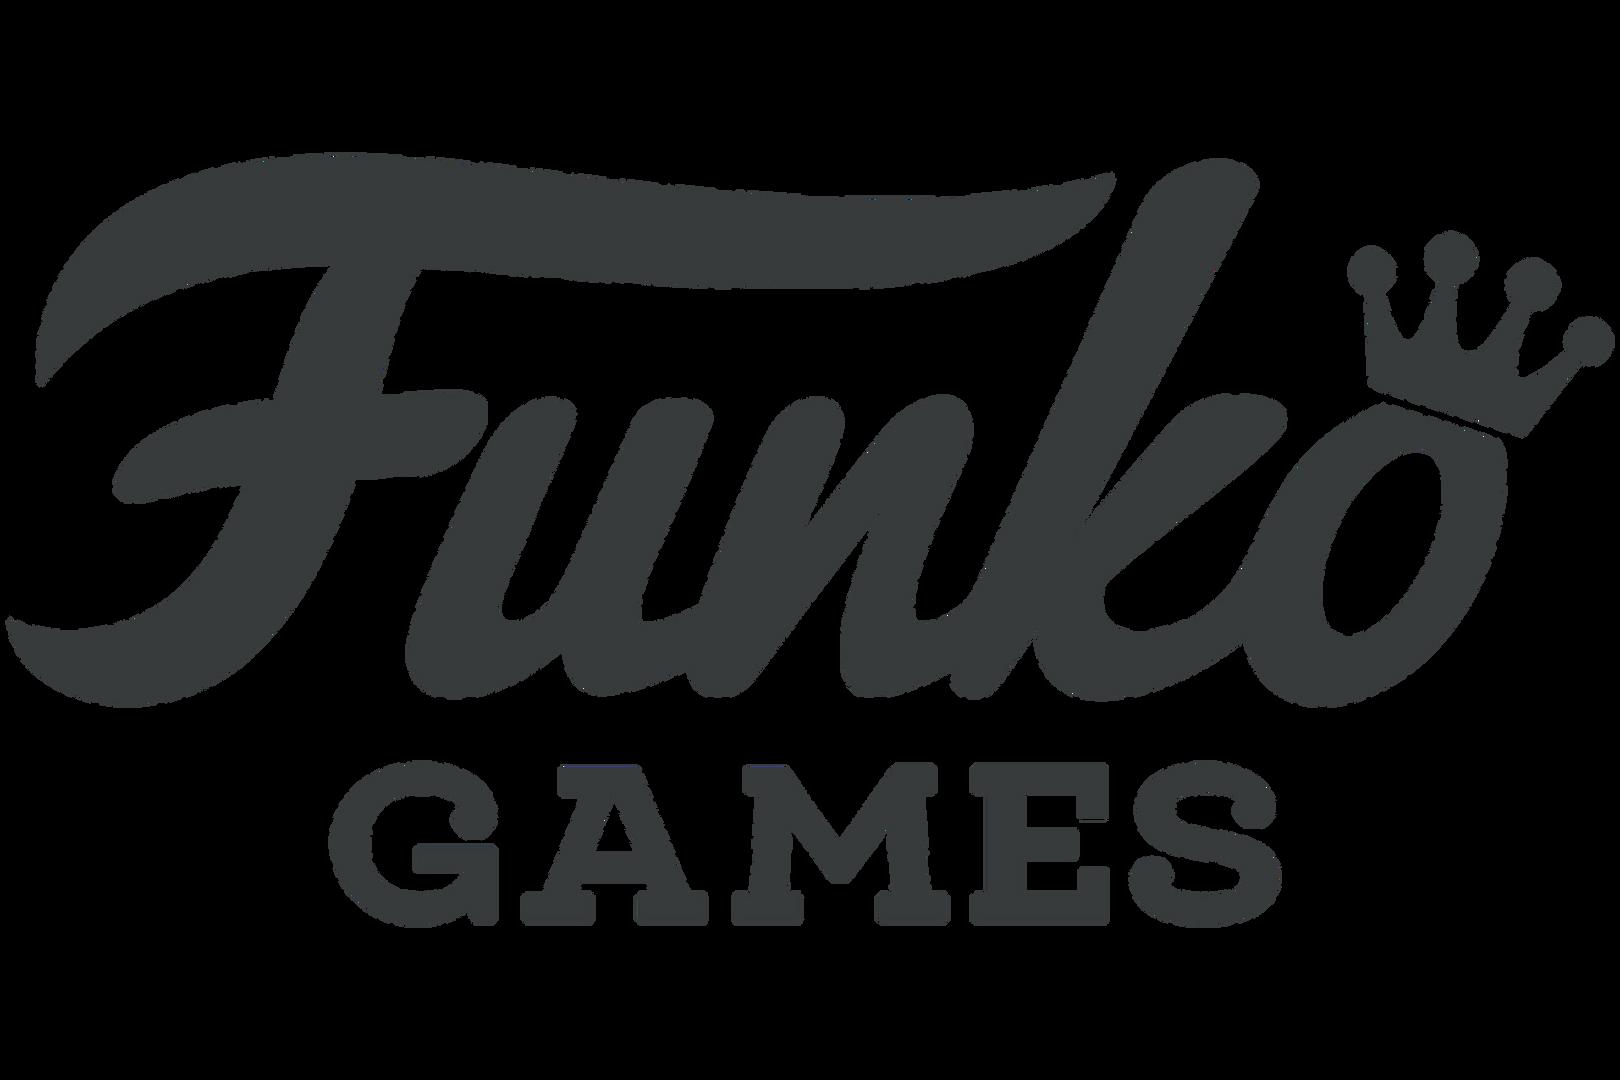 funko games logo_transparent_grey.png